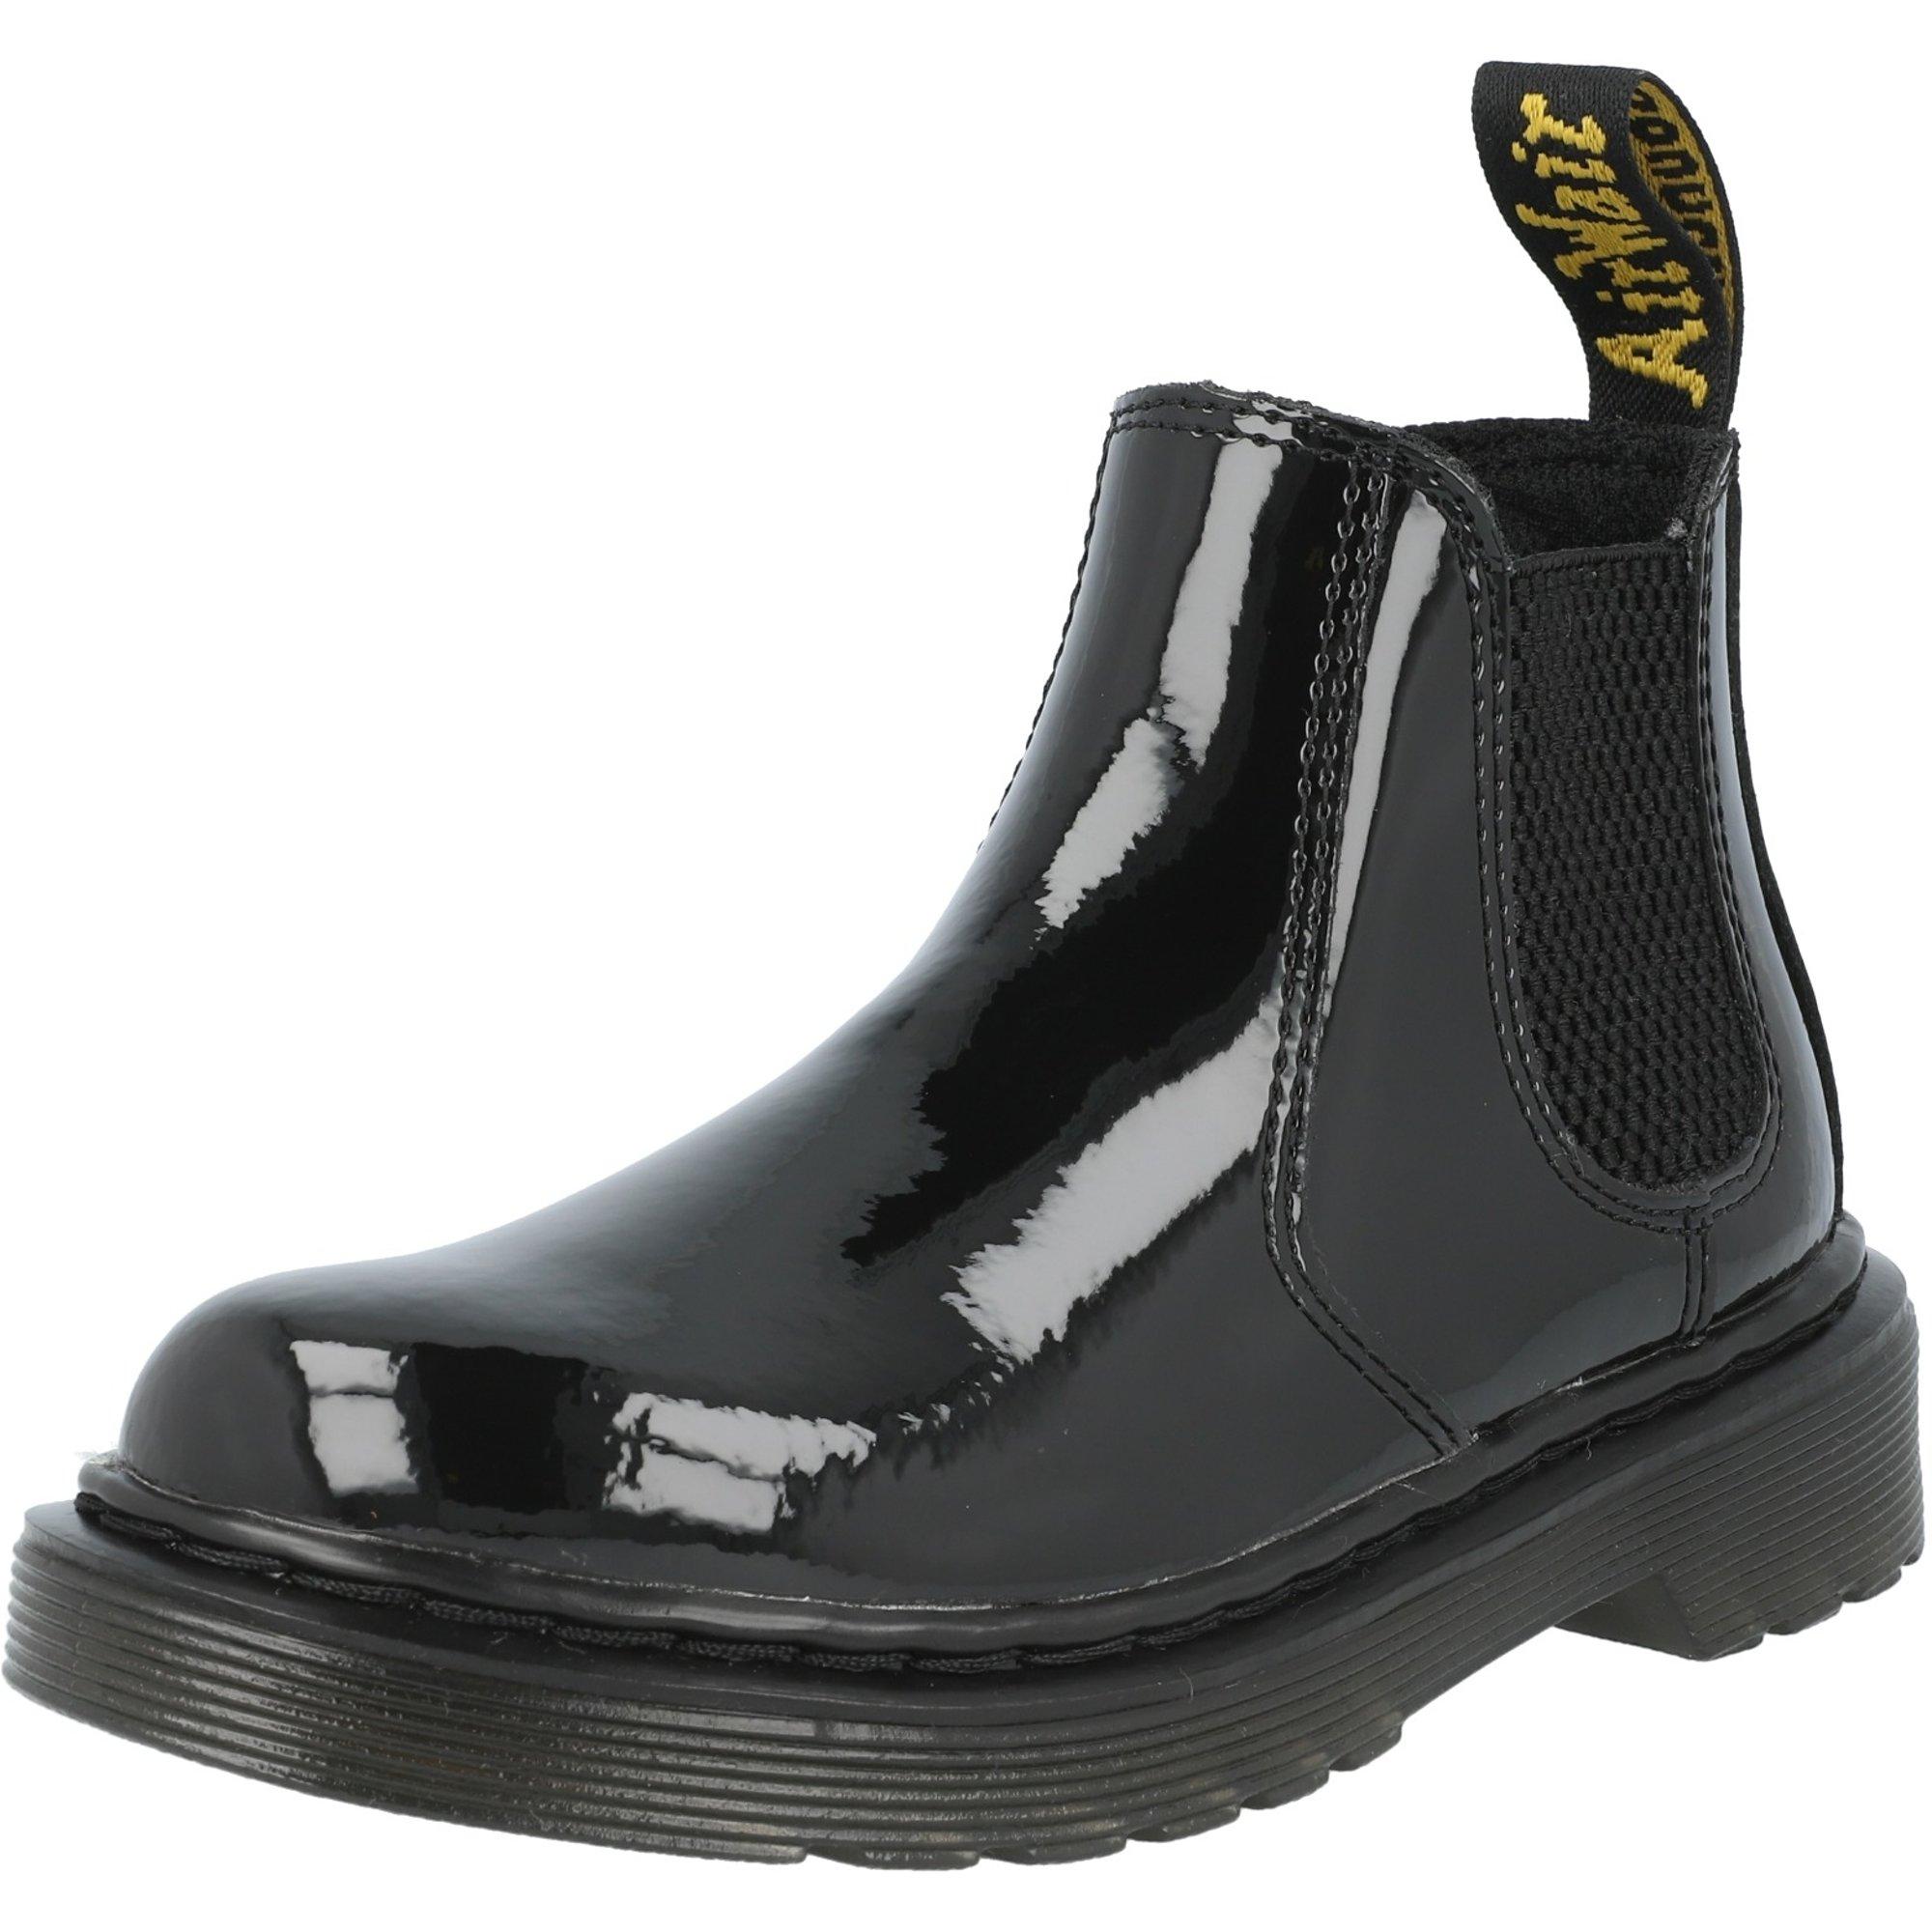 trigo sin En el nombre  Dr Martens 2976 J Negro Charol Lamper - Chelsea Botas - Awesome Shoes